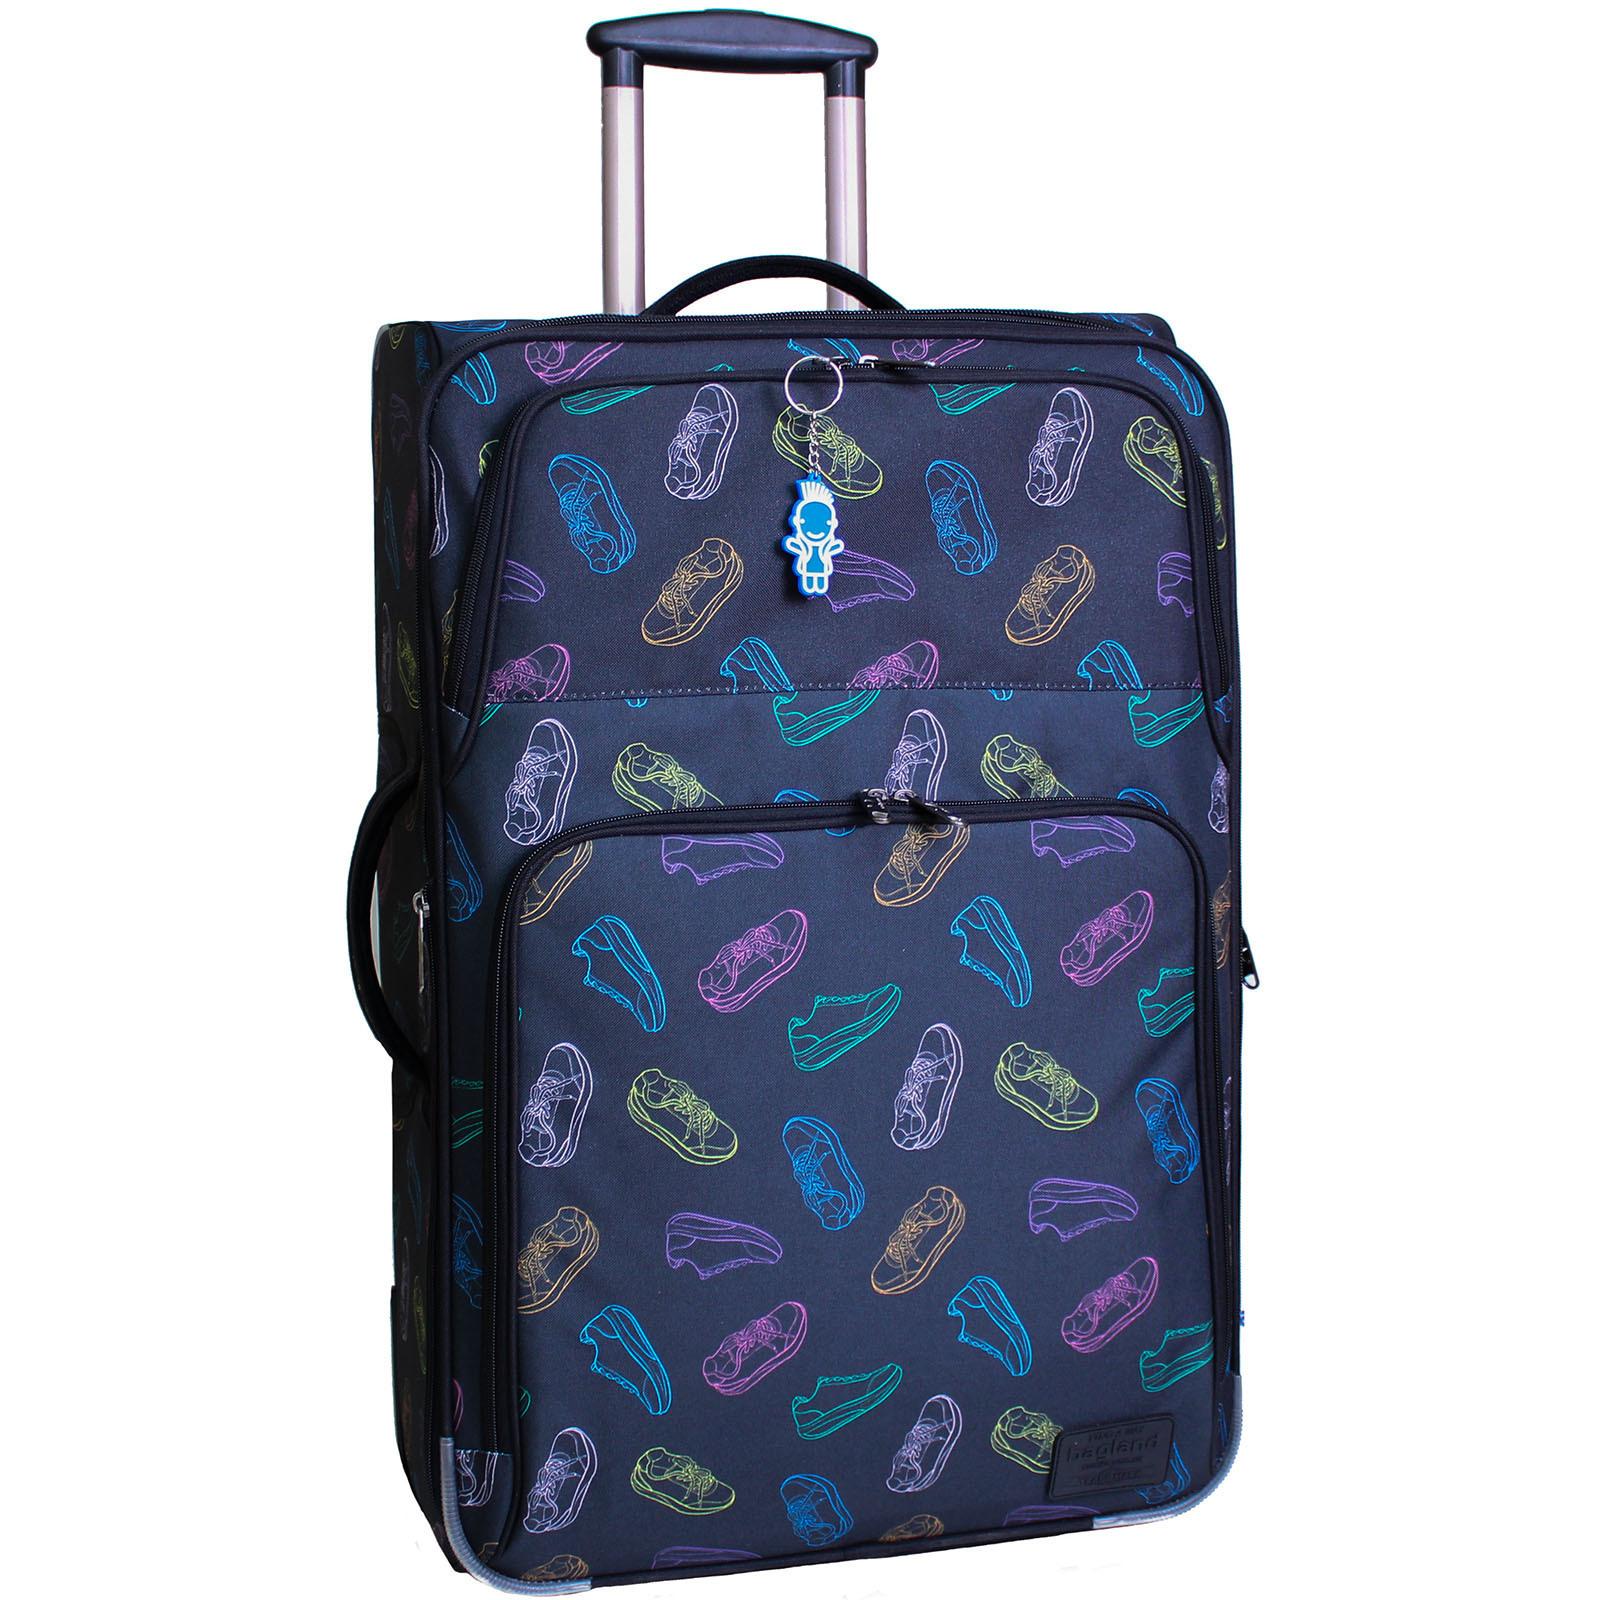 Дорожные чемоданы Чемодан Bagland Леон большой дизайн 70 л. сублімація 172 (0037666274) IMG_6583-1600.jpg